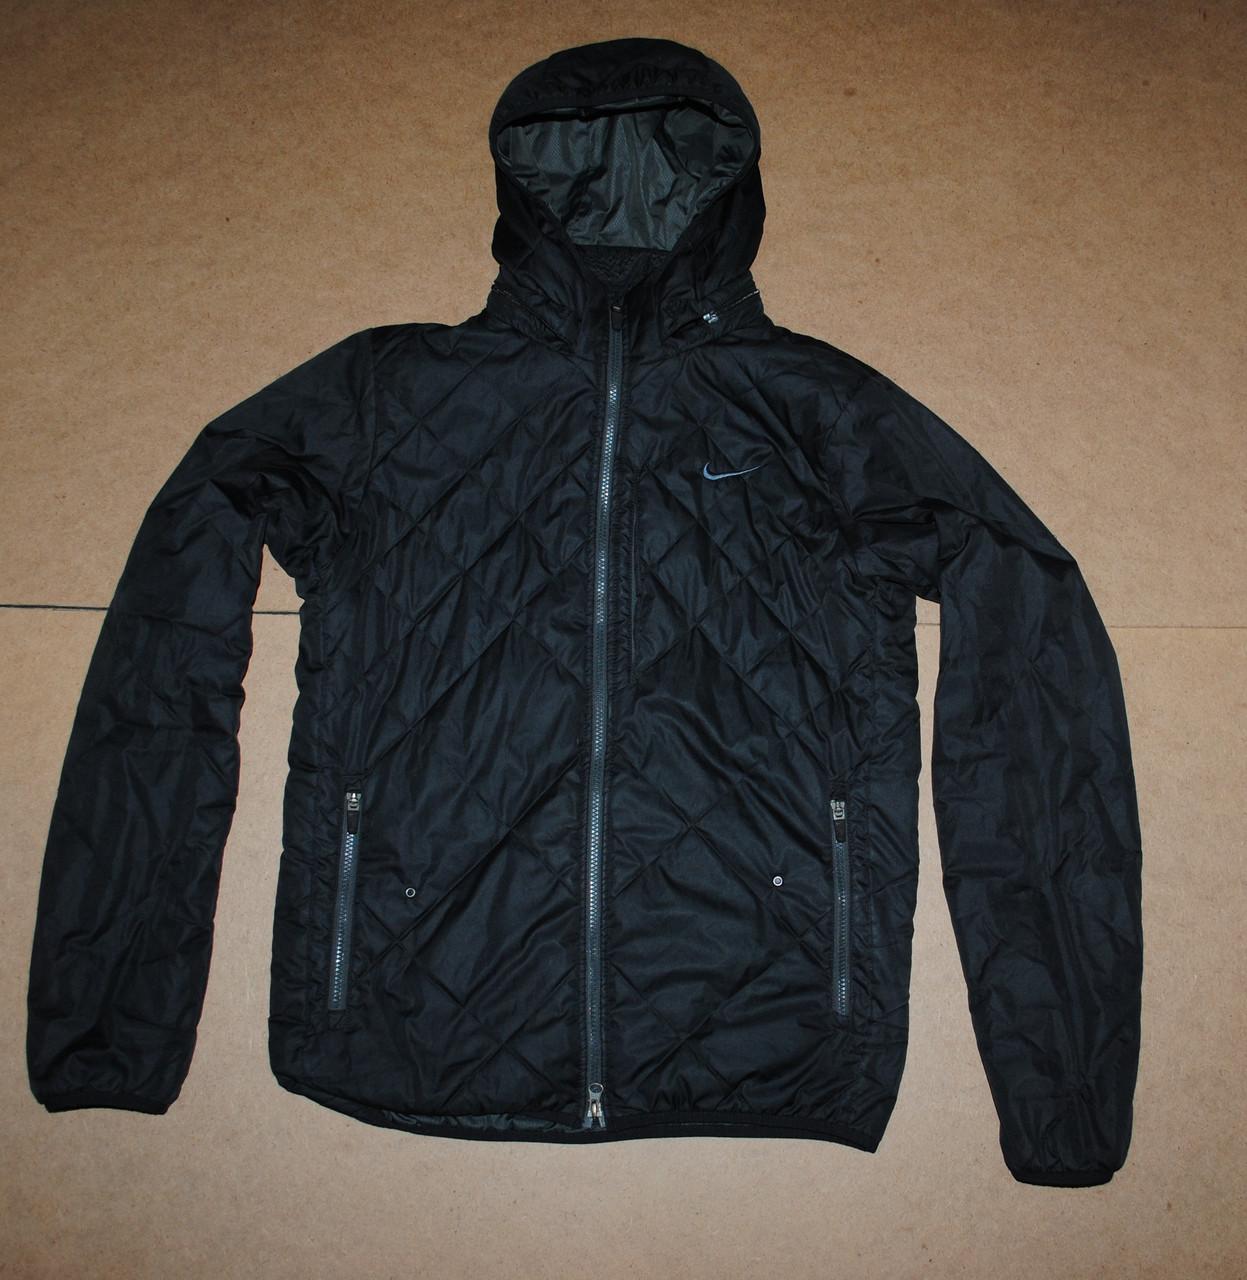 41be7ead Nike storm-fit куртка оригинал найк стеганая, цена 695 грн., купить ...